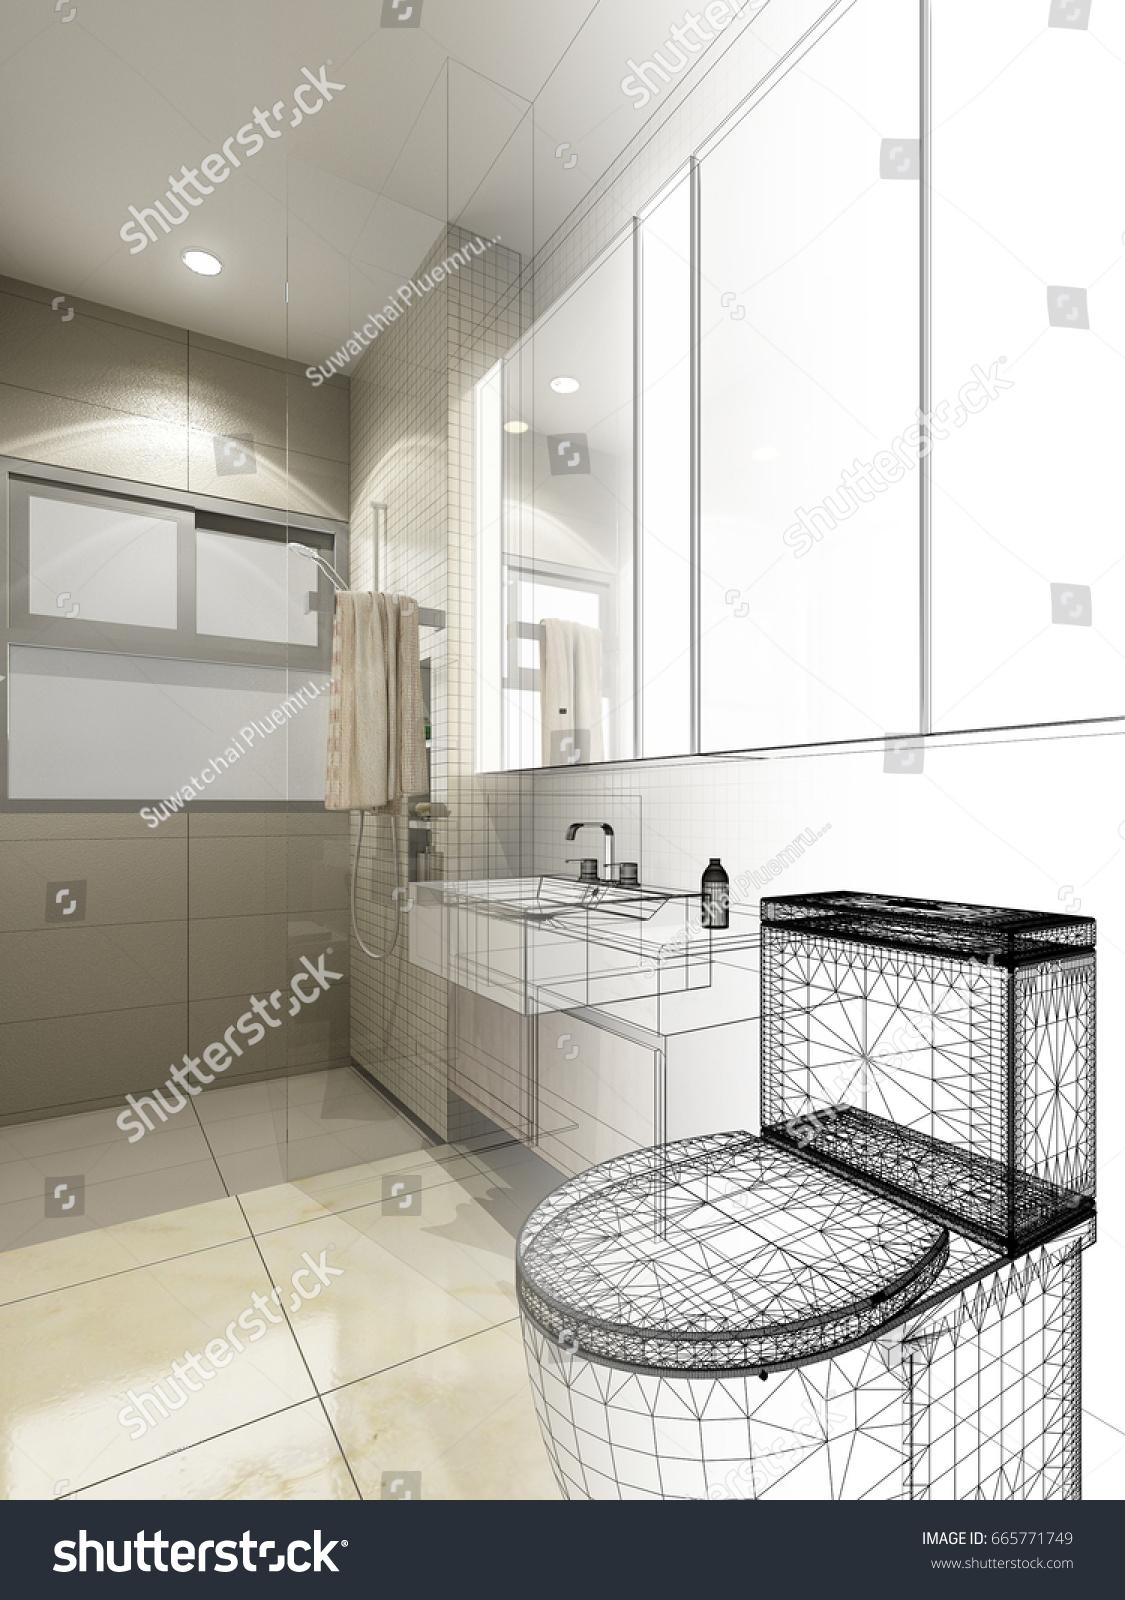 Abstract Sketch Design Interior Bathroom 3 D Stock Illustration ...